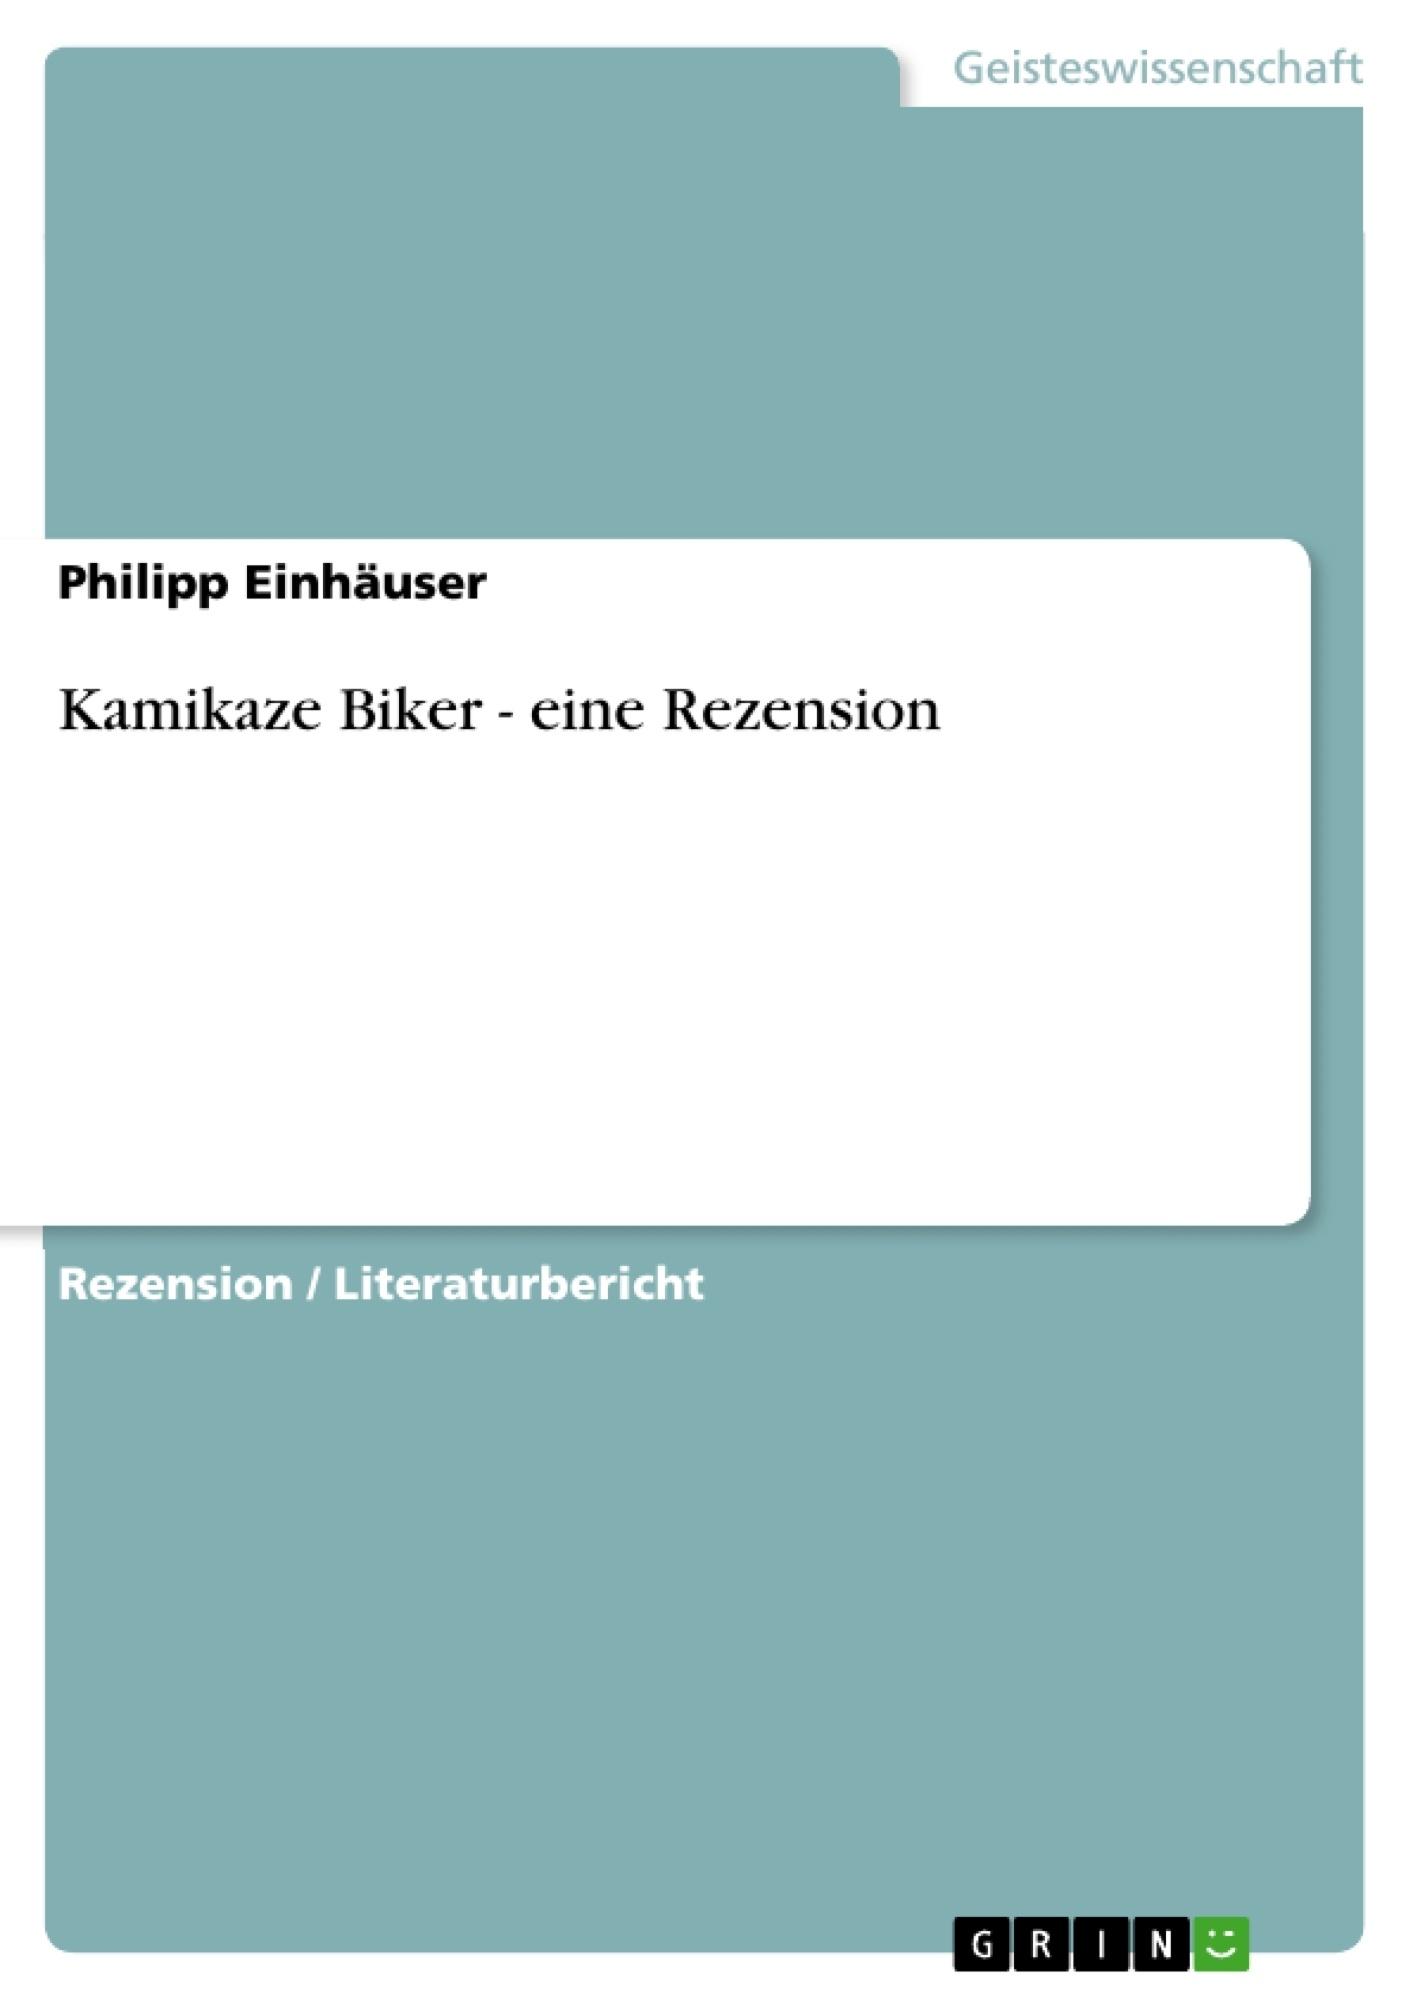 Titel: Kamikaze Biker - eine Rezension